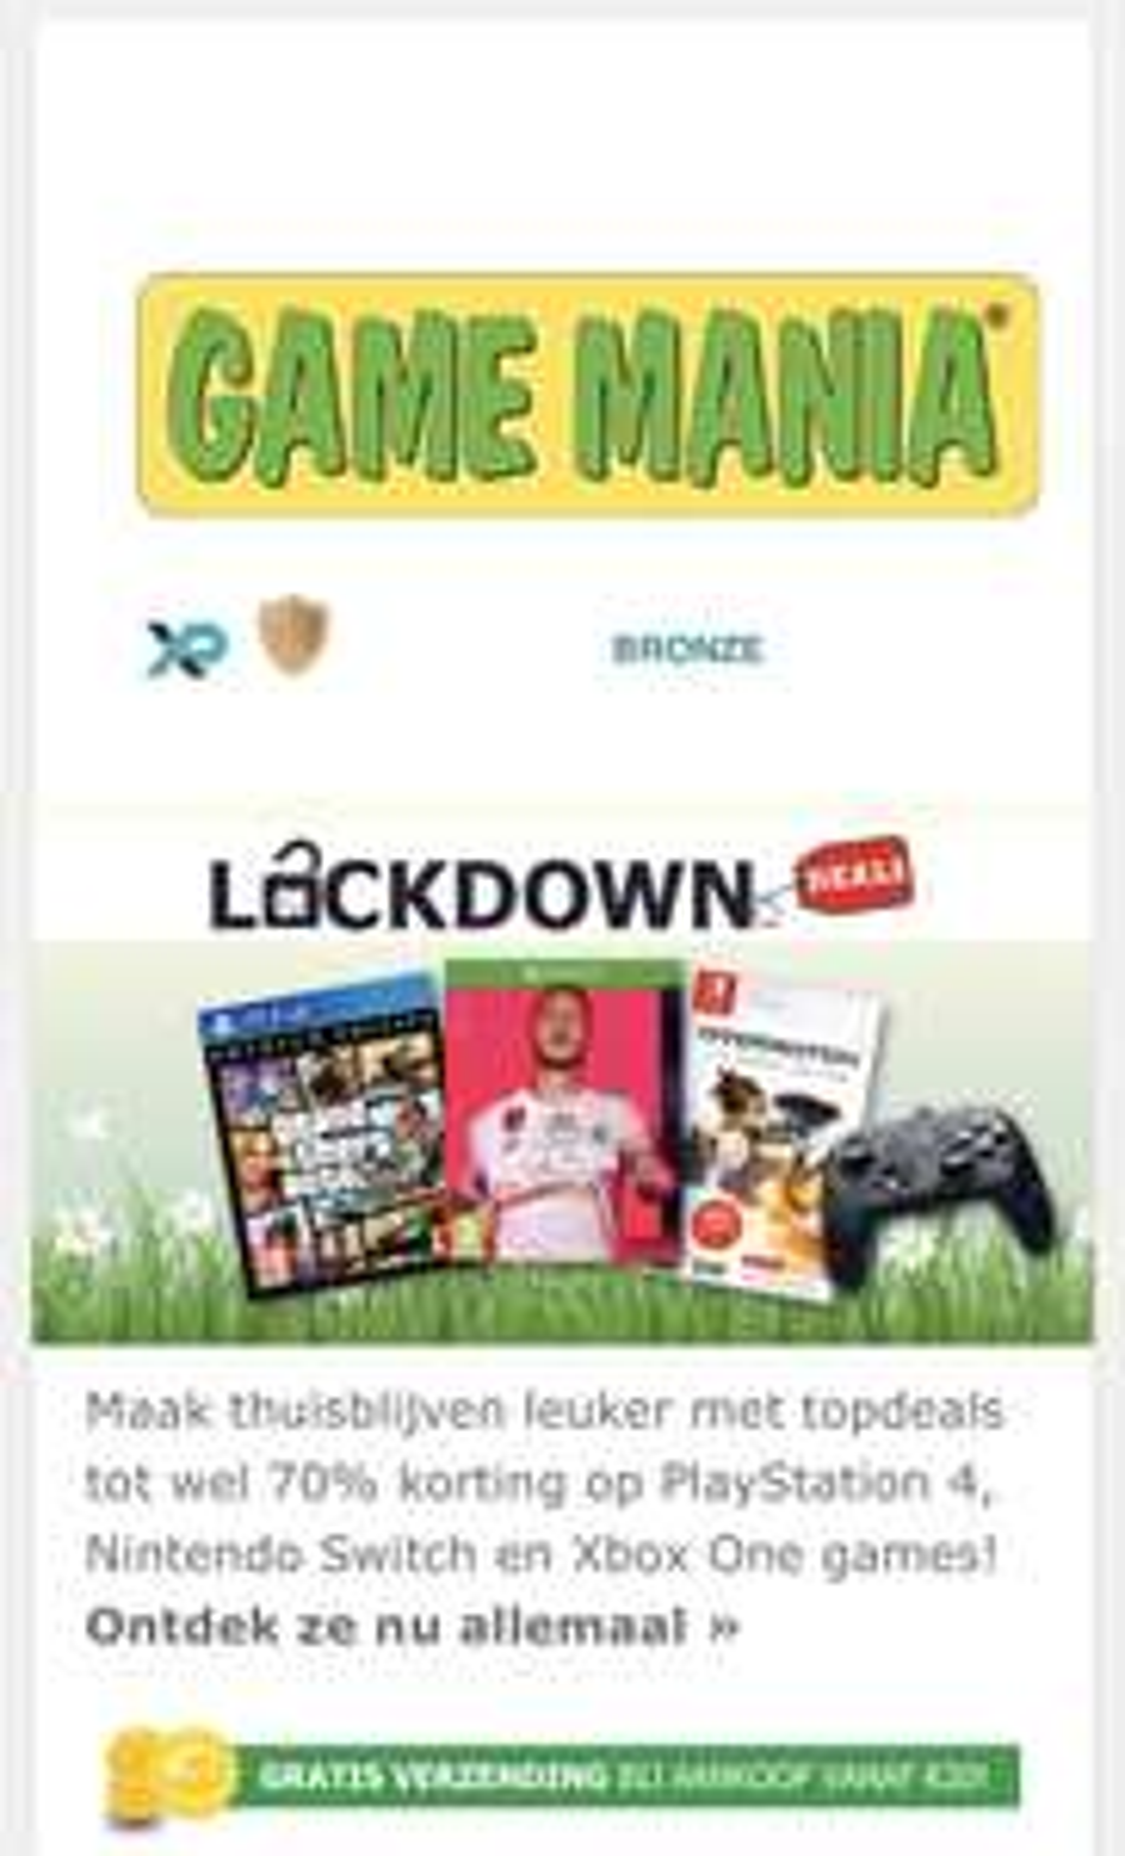 Game mania Lockdown deals